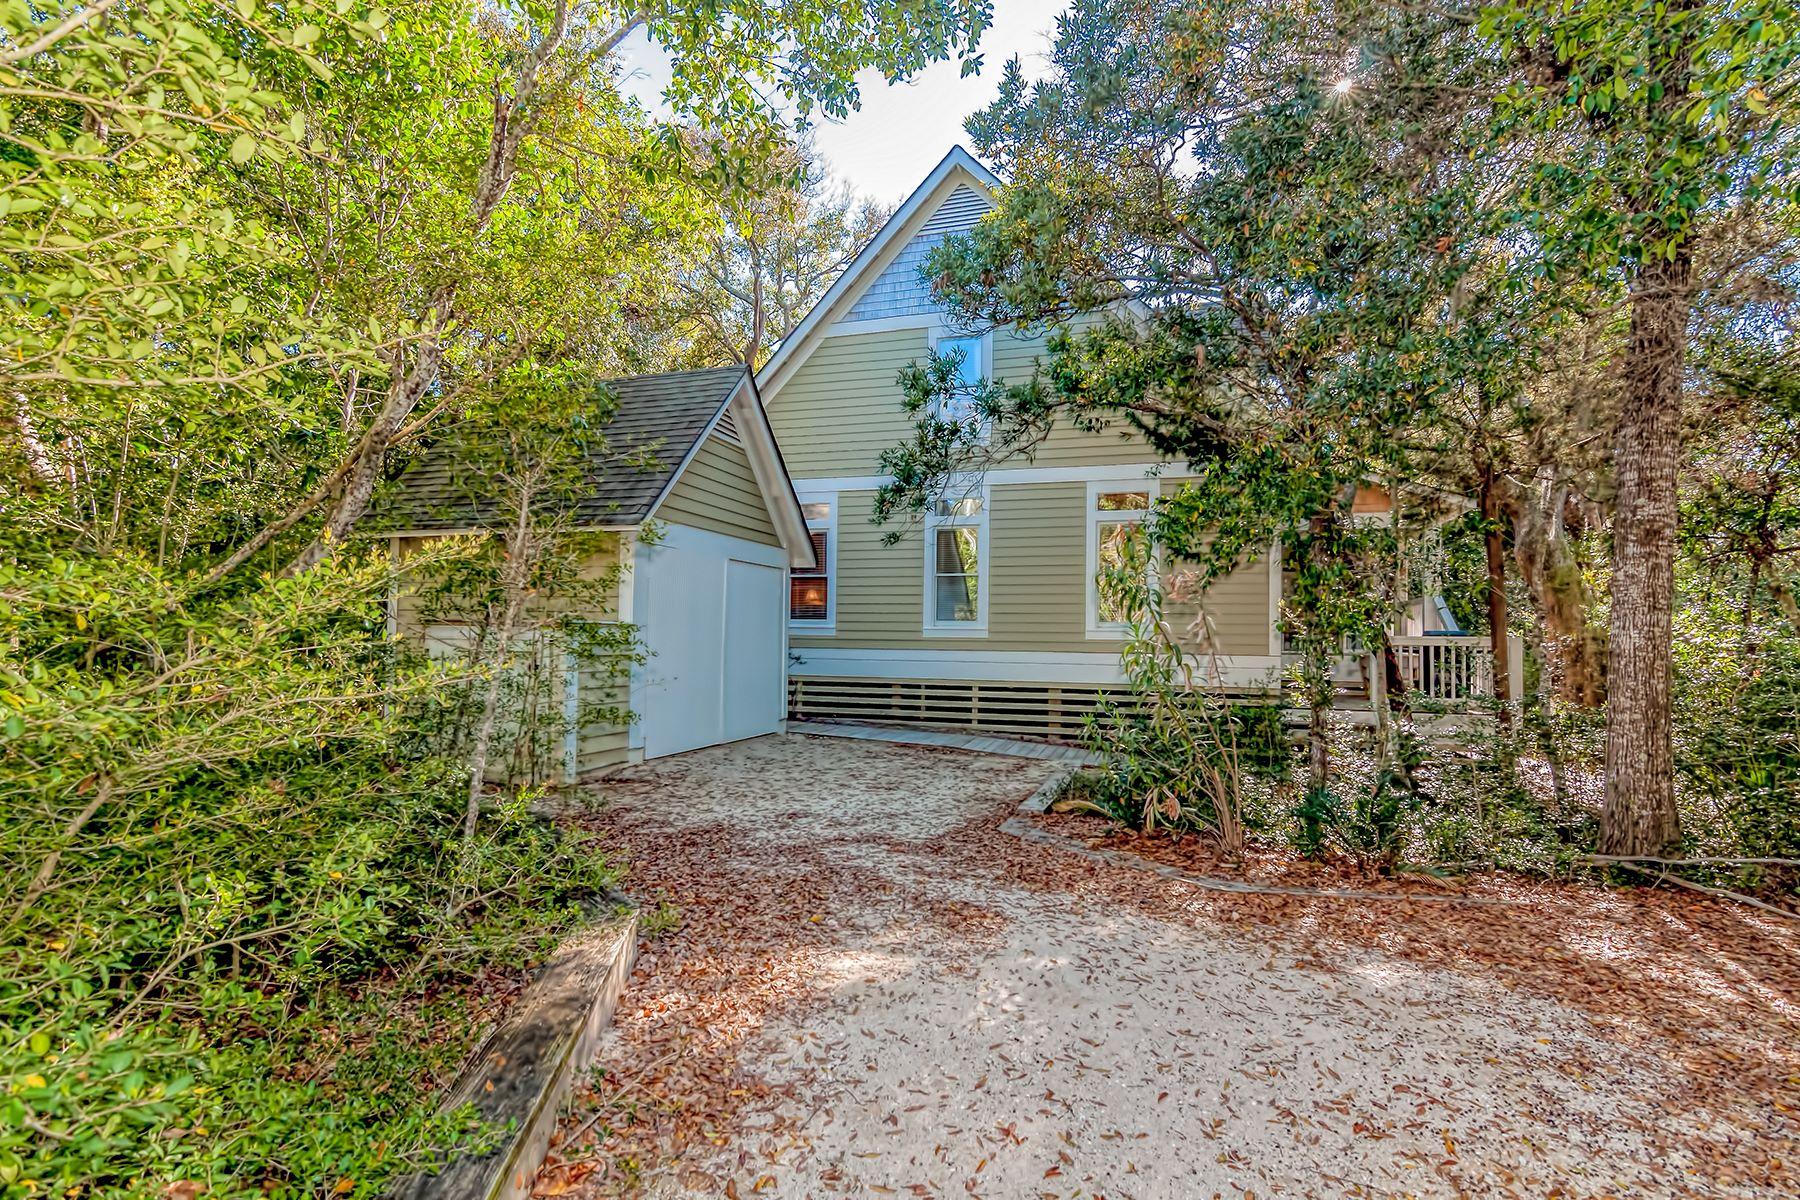 Single Family Home for Sale at Beach Cottage among the Island's Magical Live Oaks 11 Sandwich Tern Trail Bald Head Island, North Carolina, 28461 United States